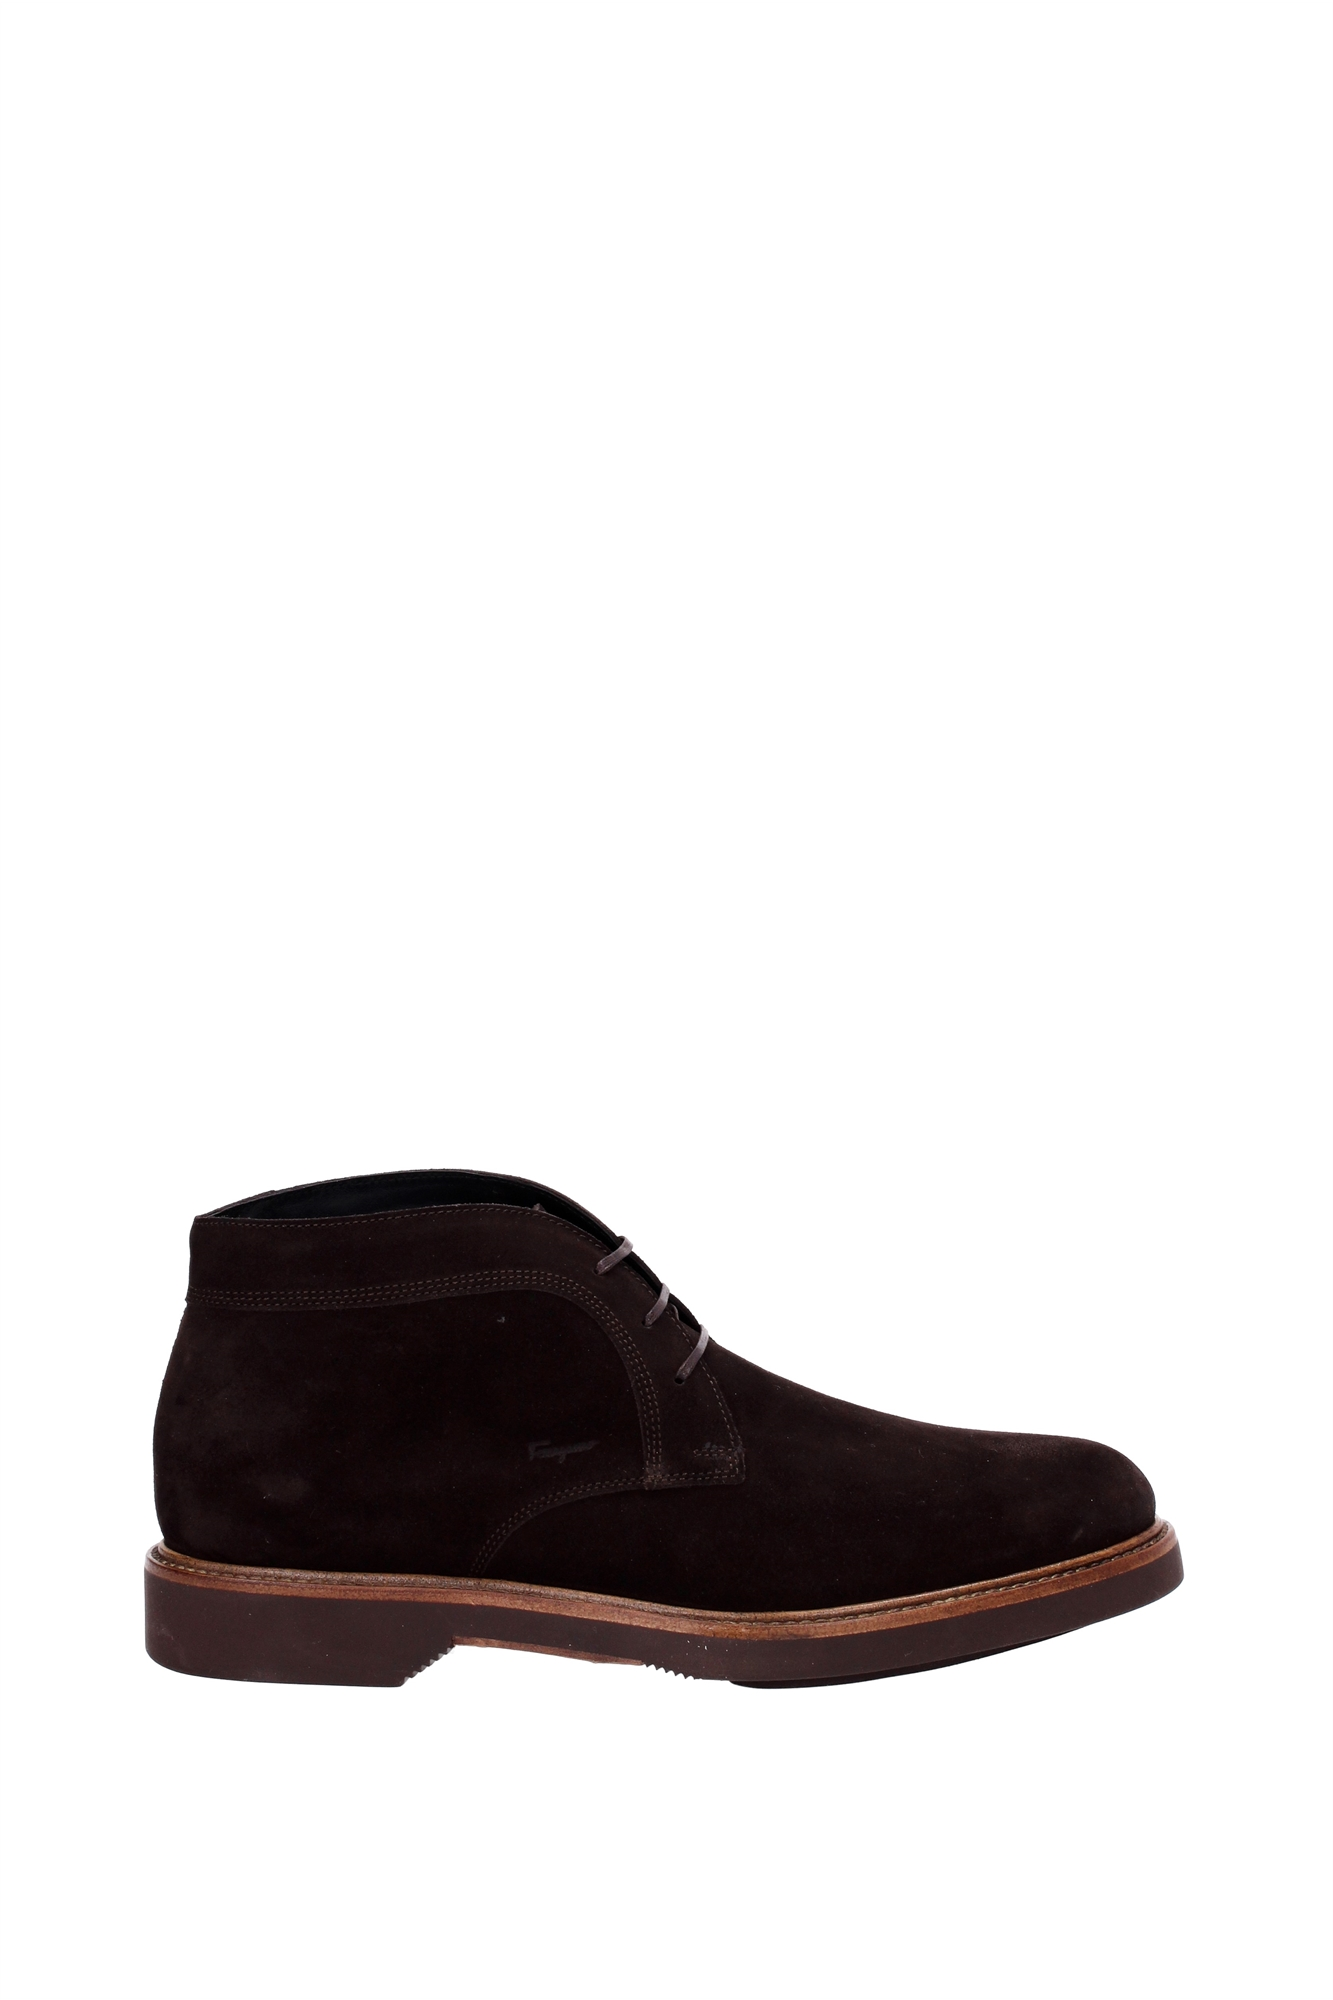 ankle boots salvatore ferragamo suede brown